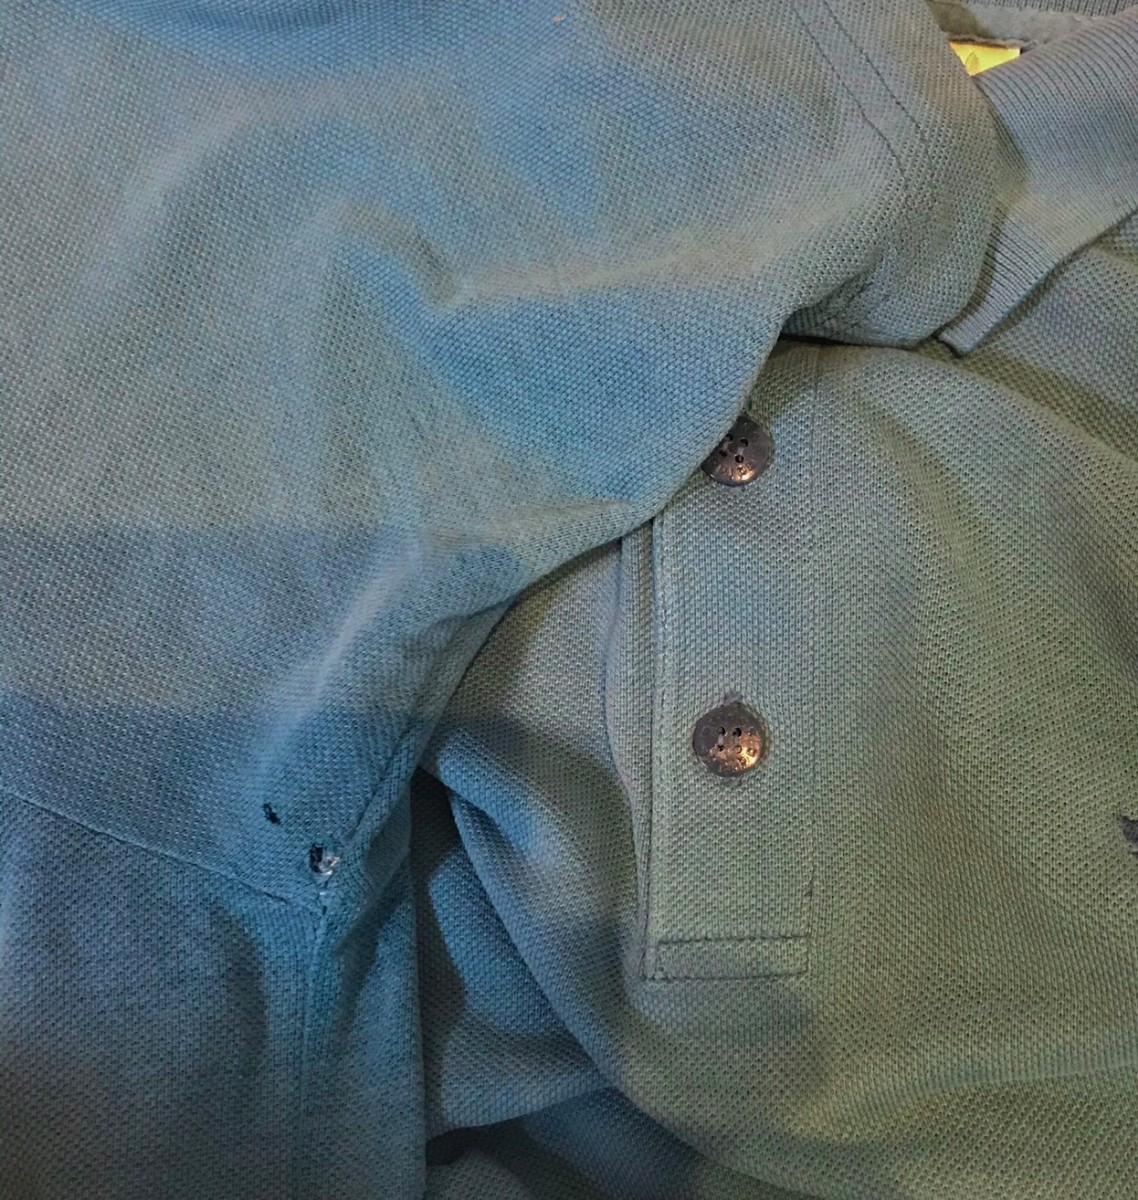 adidas アディダス ポロシャツ 半袖 ターコイズブルー 青 水色 メンズ